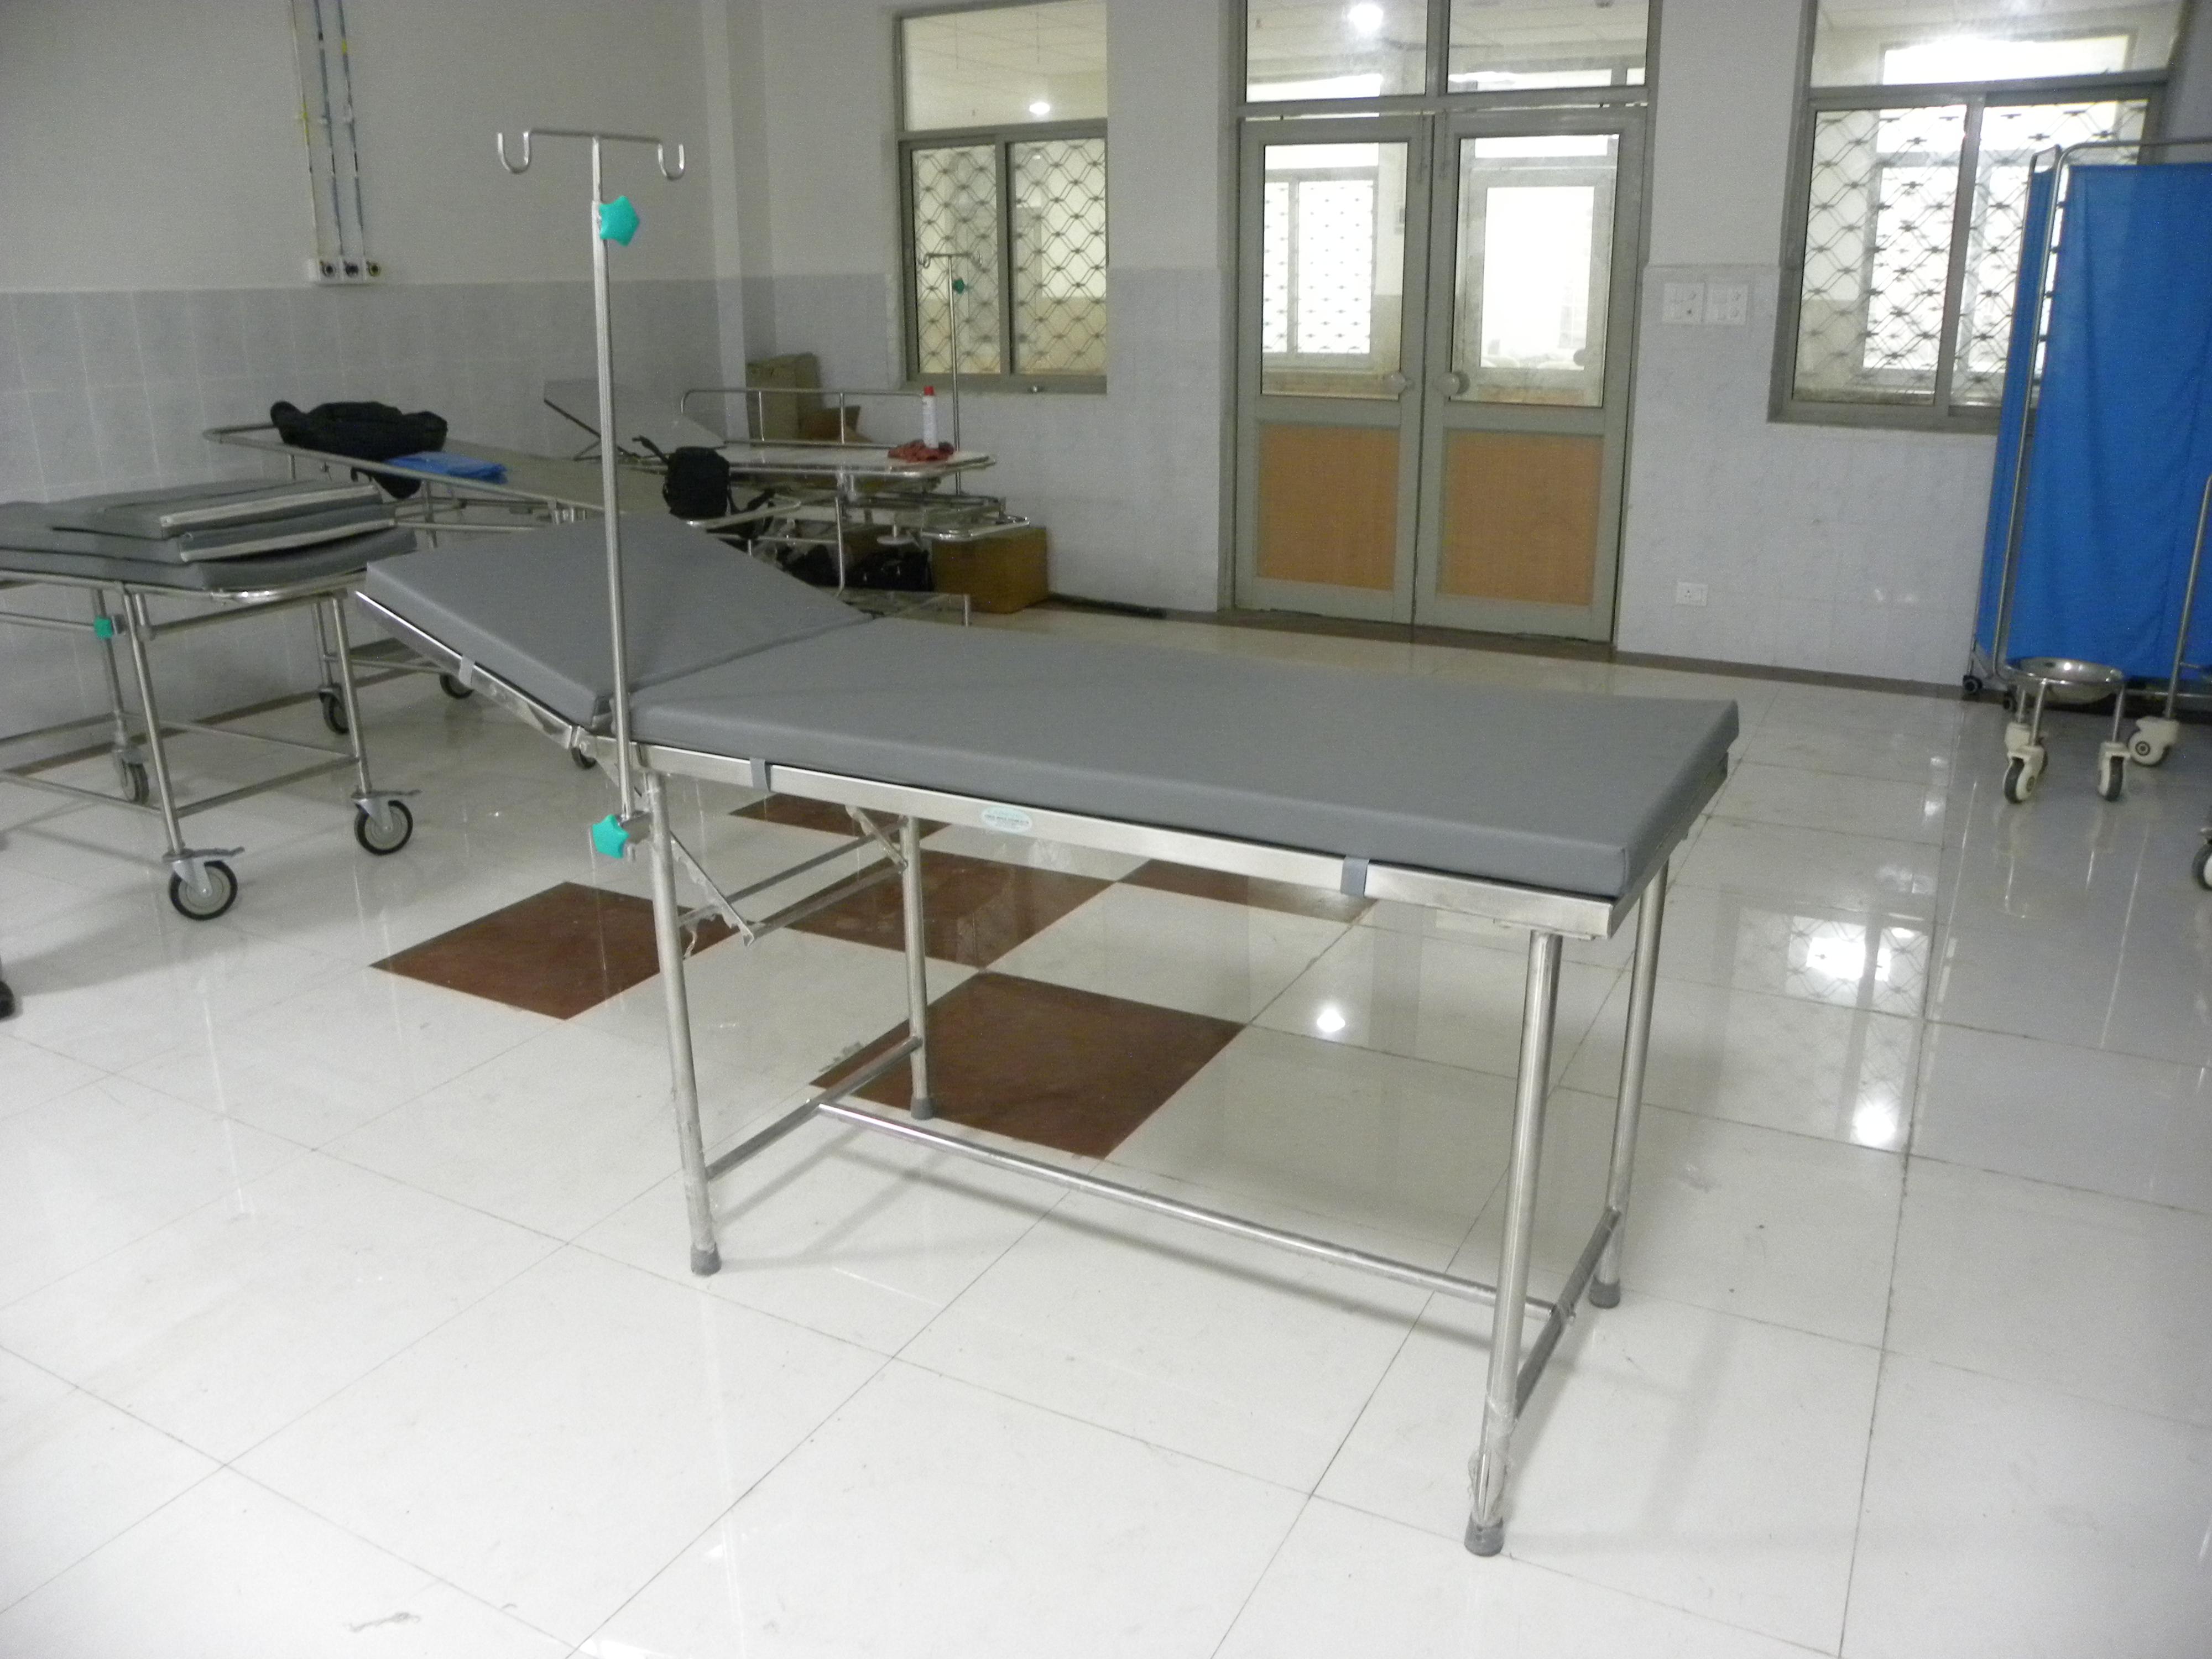 Hospital Examination Couch